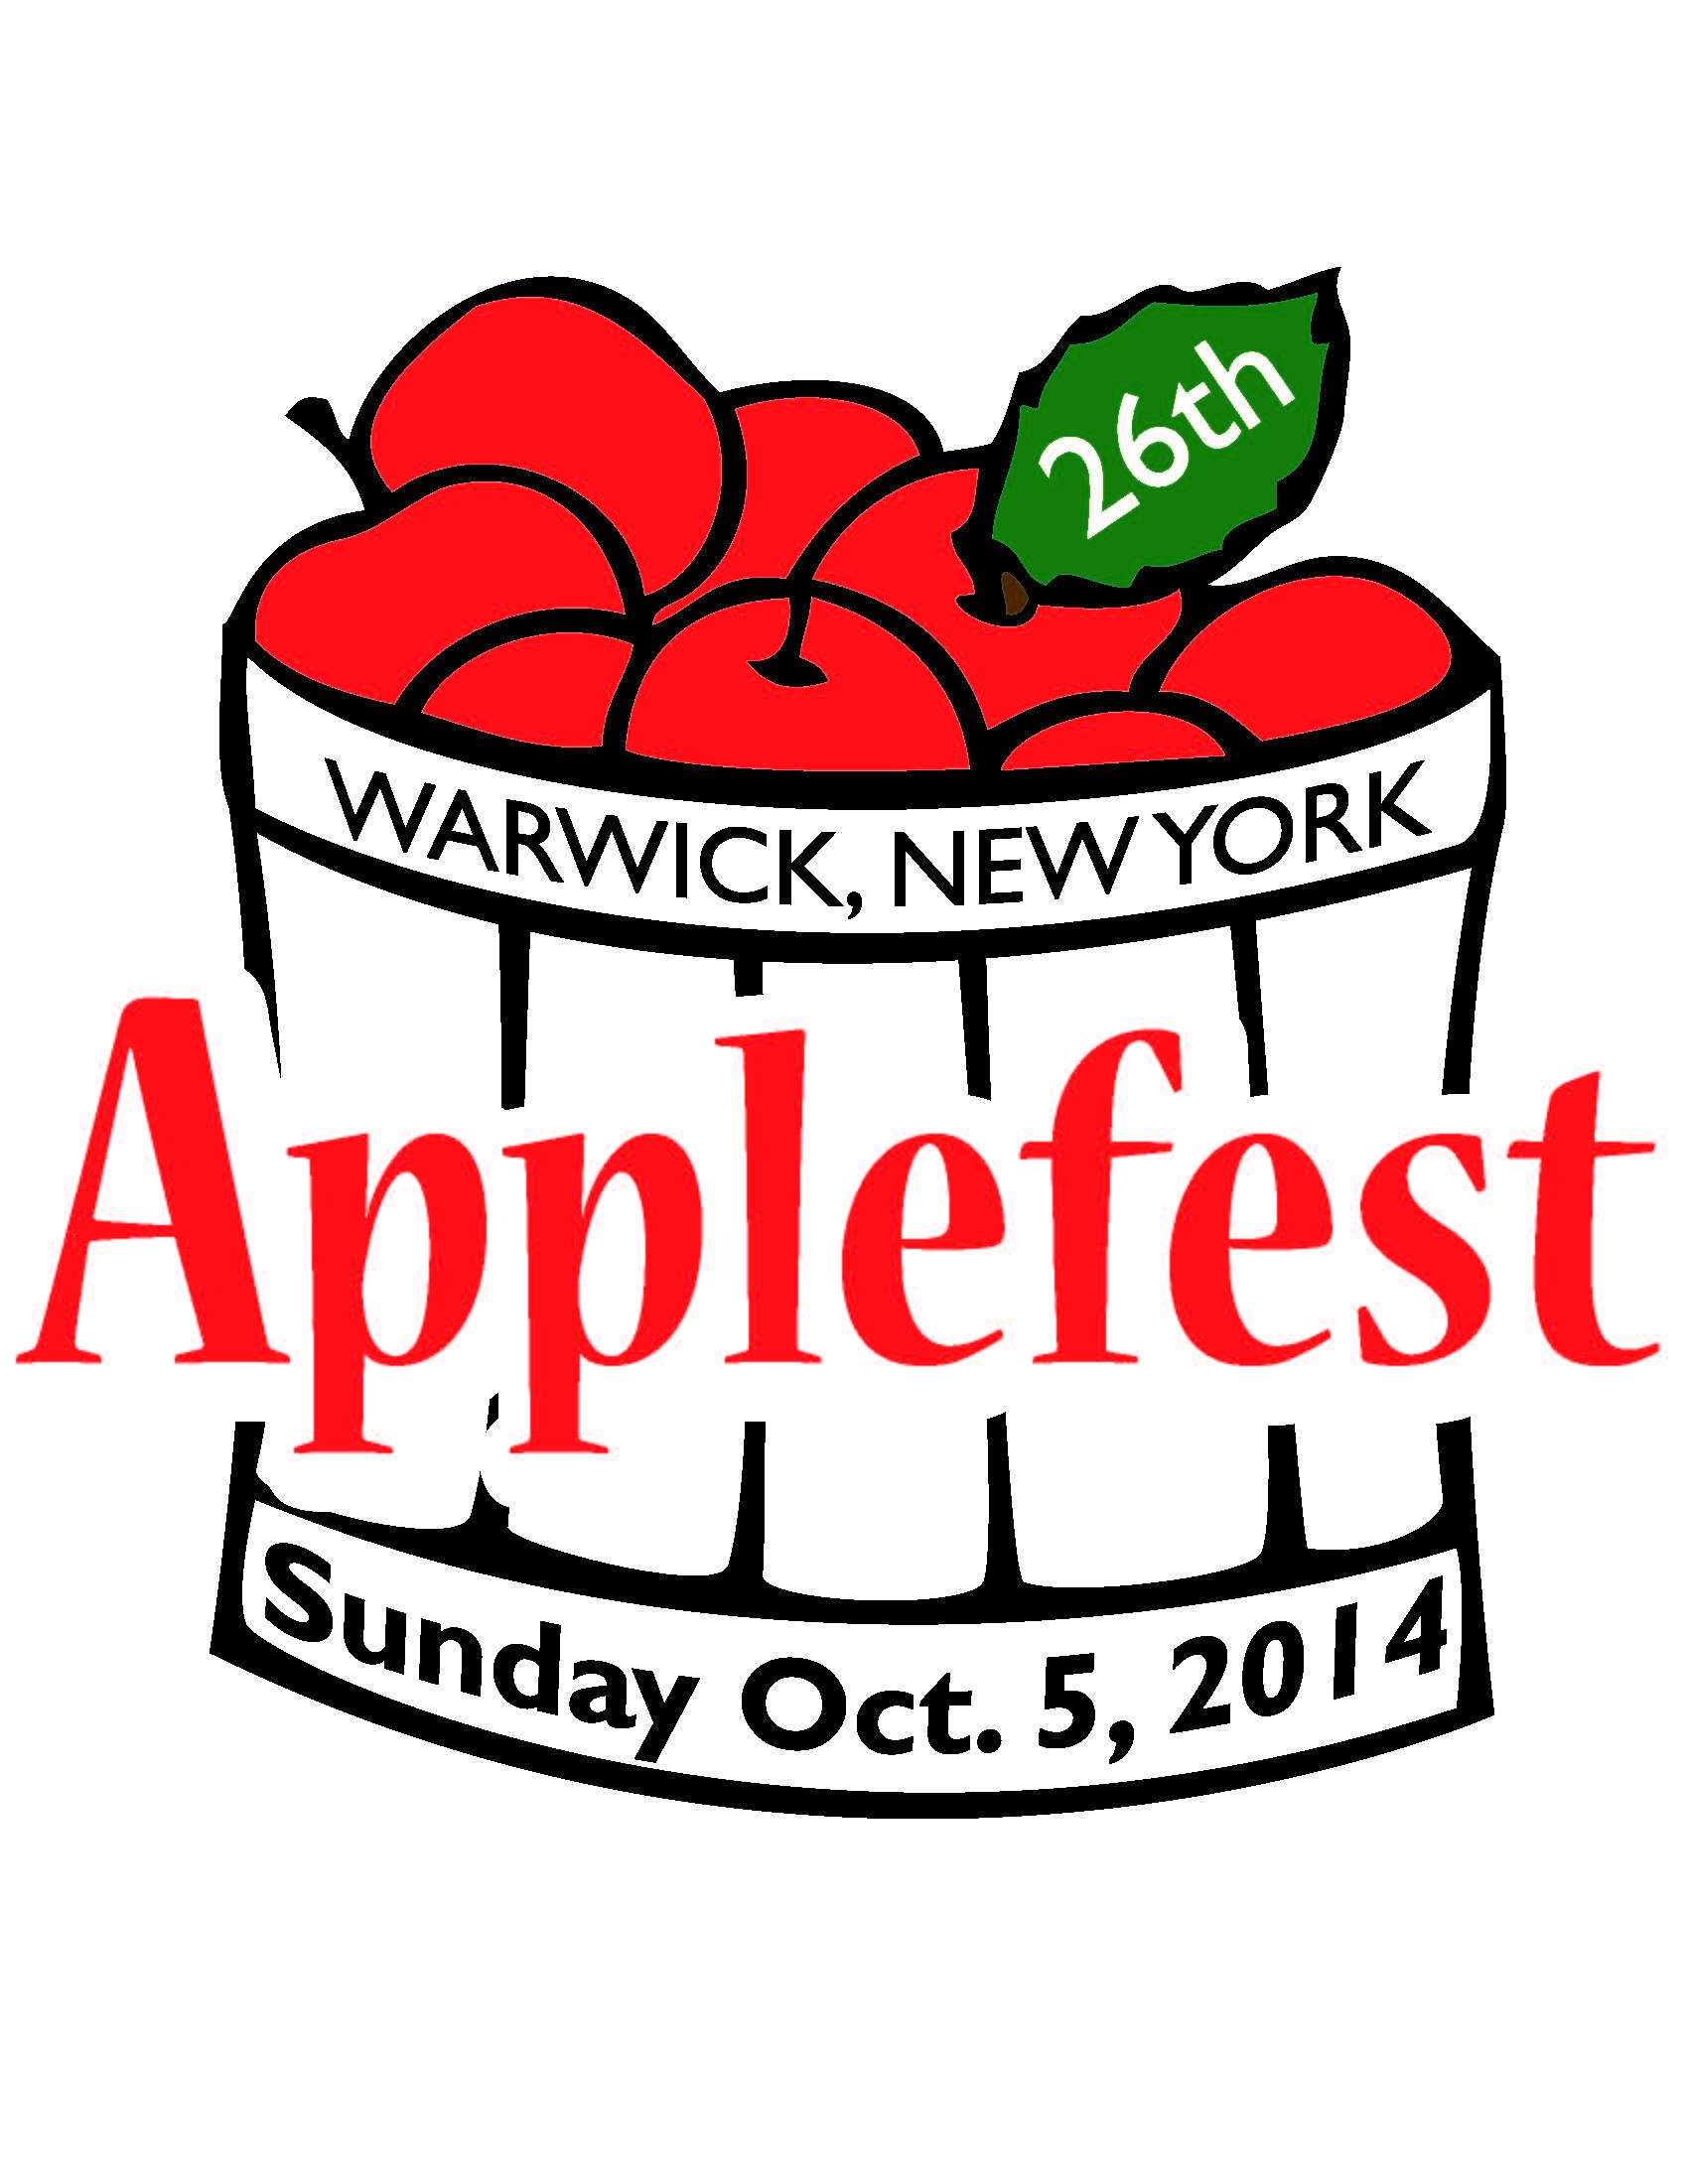 Applefest 2014